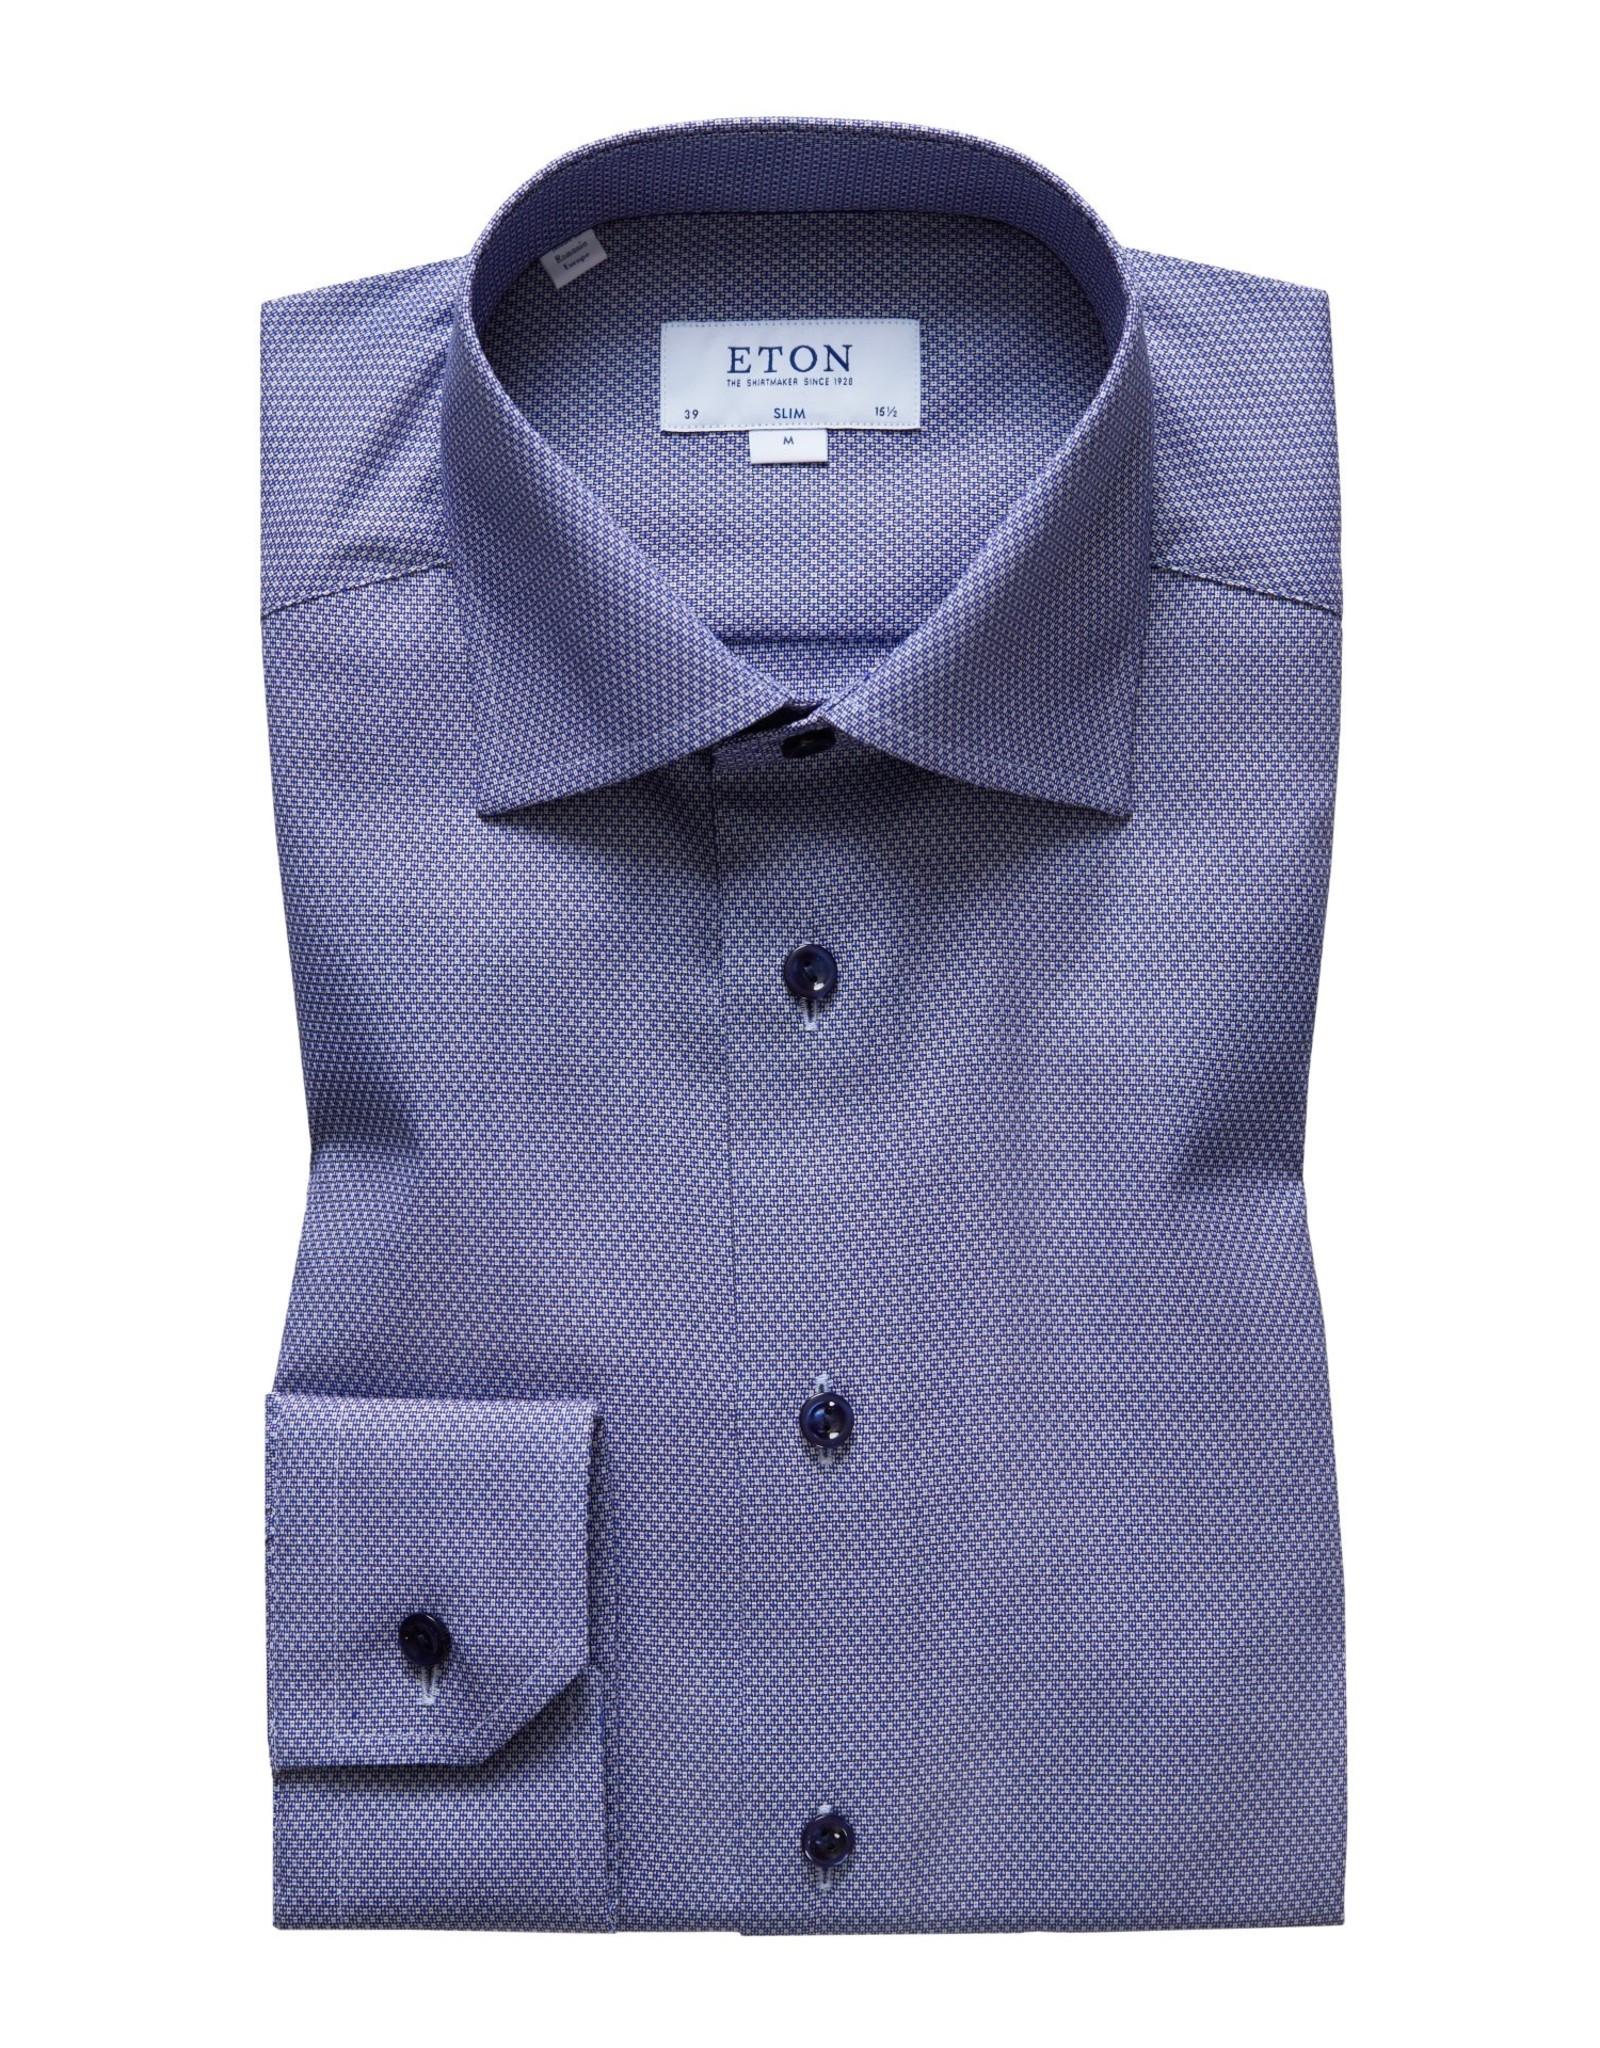 Eton Eton hemd blauw slim 4067-61544/27